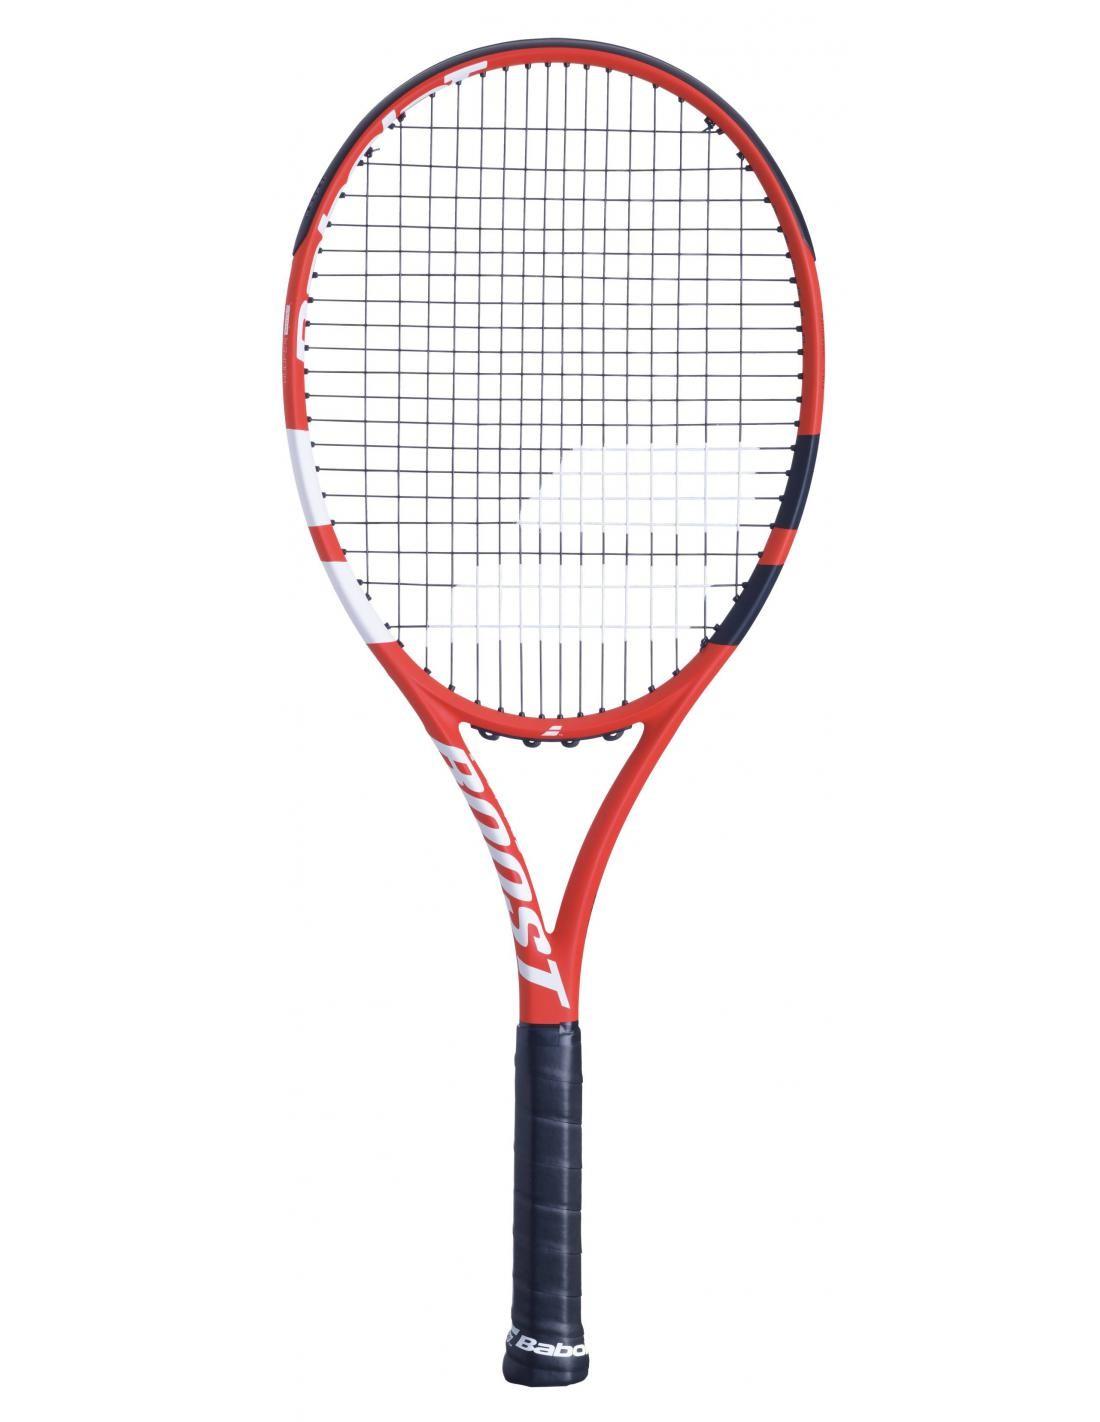 Rakieta tenisowa Babolat Boost Strike